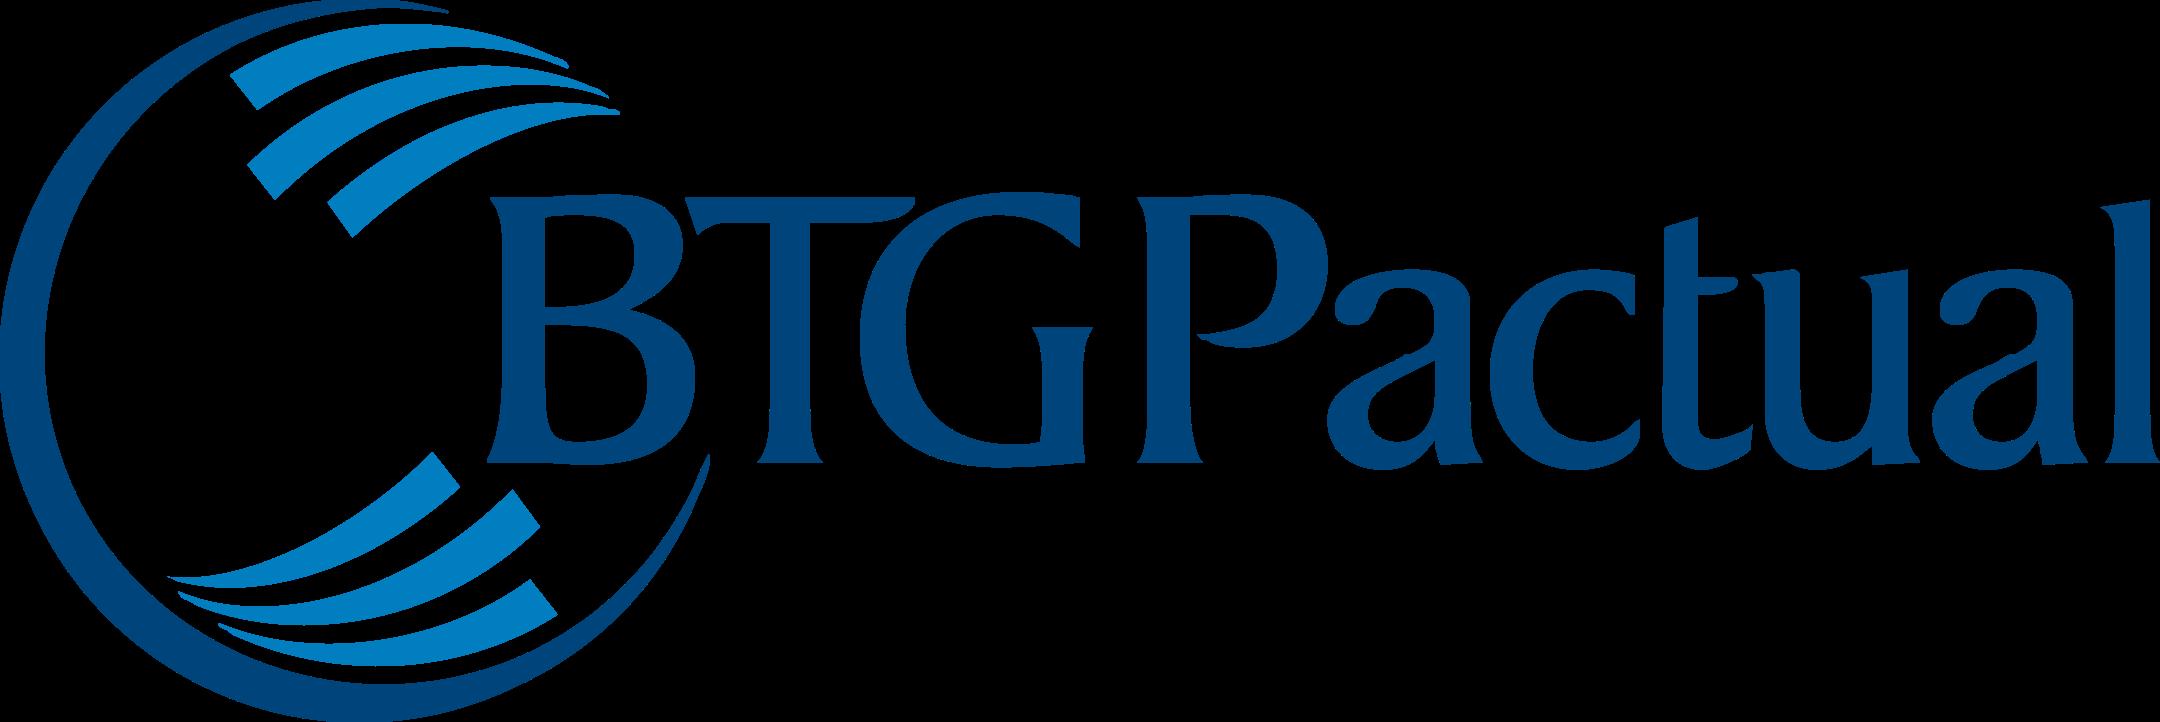 btg pactual logo 1 1 - BTG Pactual Logo